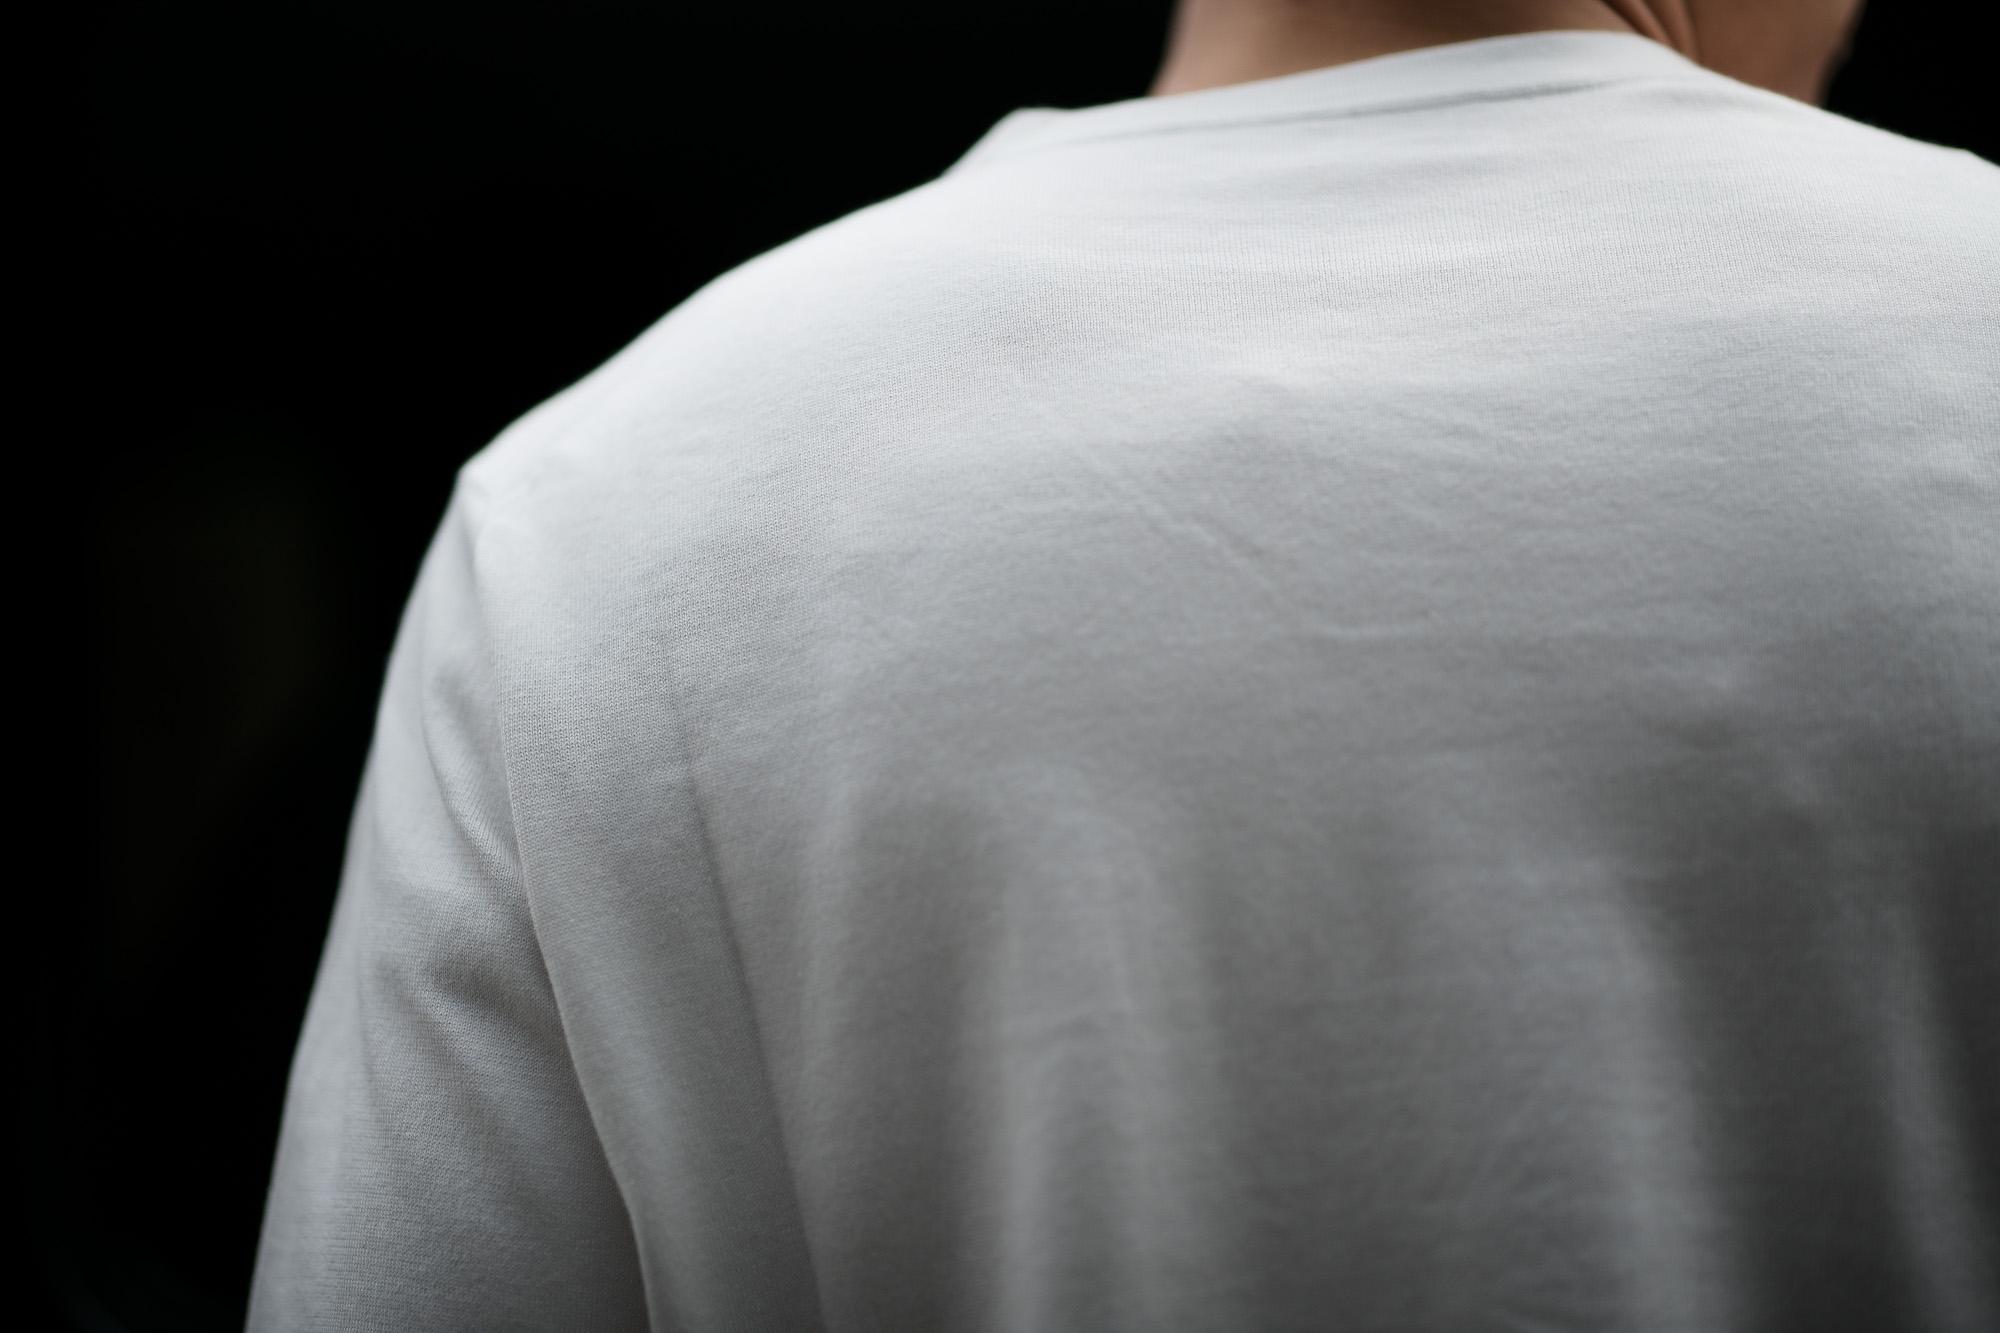 lucien pellat-finet (ルシアン ペラフィネ) SKULL & LEAF ON CHEST ROUND NECK SHORT SLEEVE PULLOVER スカル & リーフ コットン ニット Tシャツ NIVEOUS (ホワイト) 2019 春夏新作 lucienpellatfinet 愛知 名古屋 altoediritto アルトエデリット